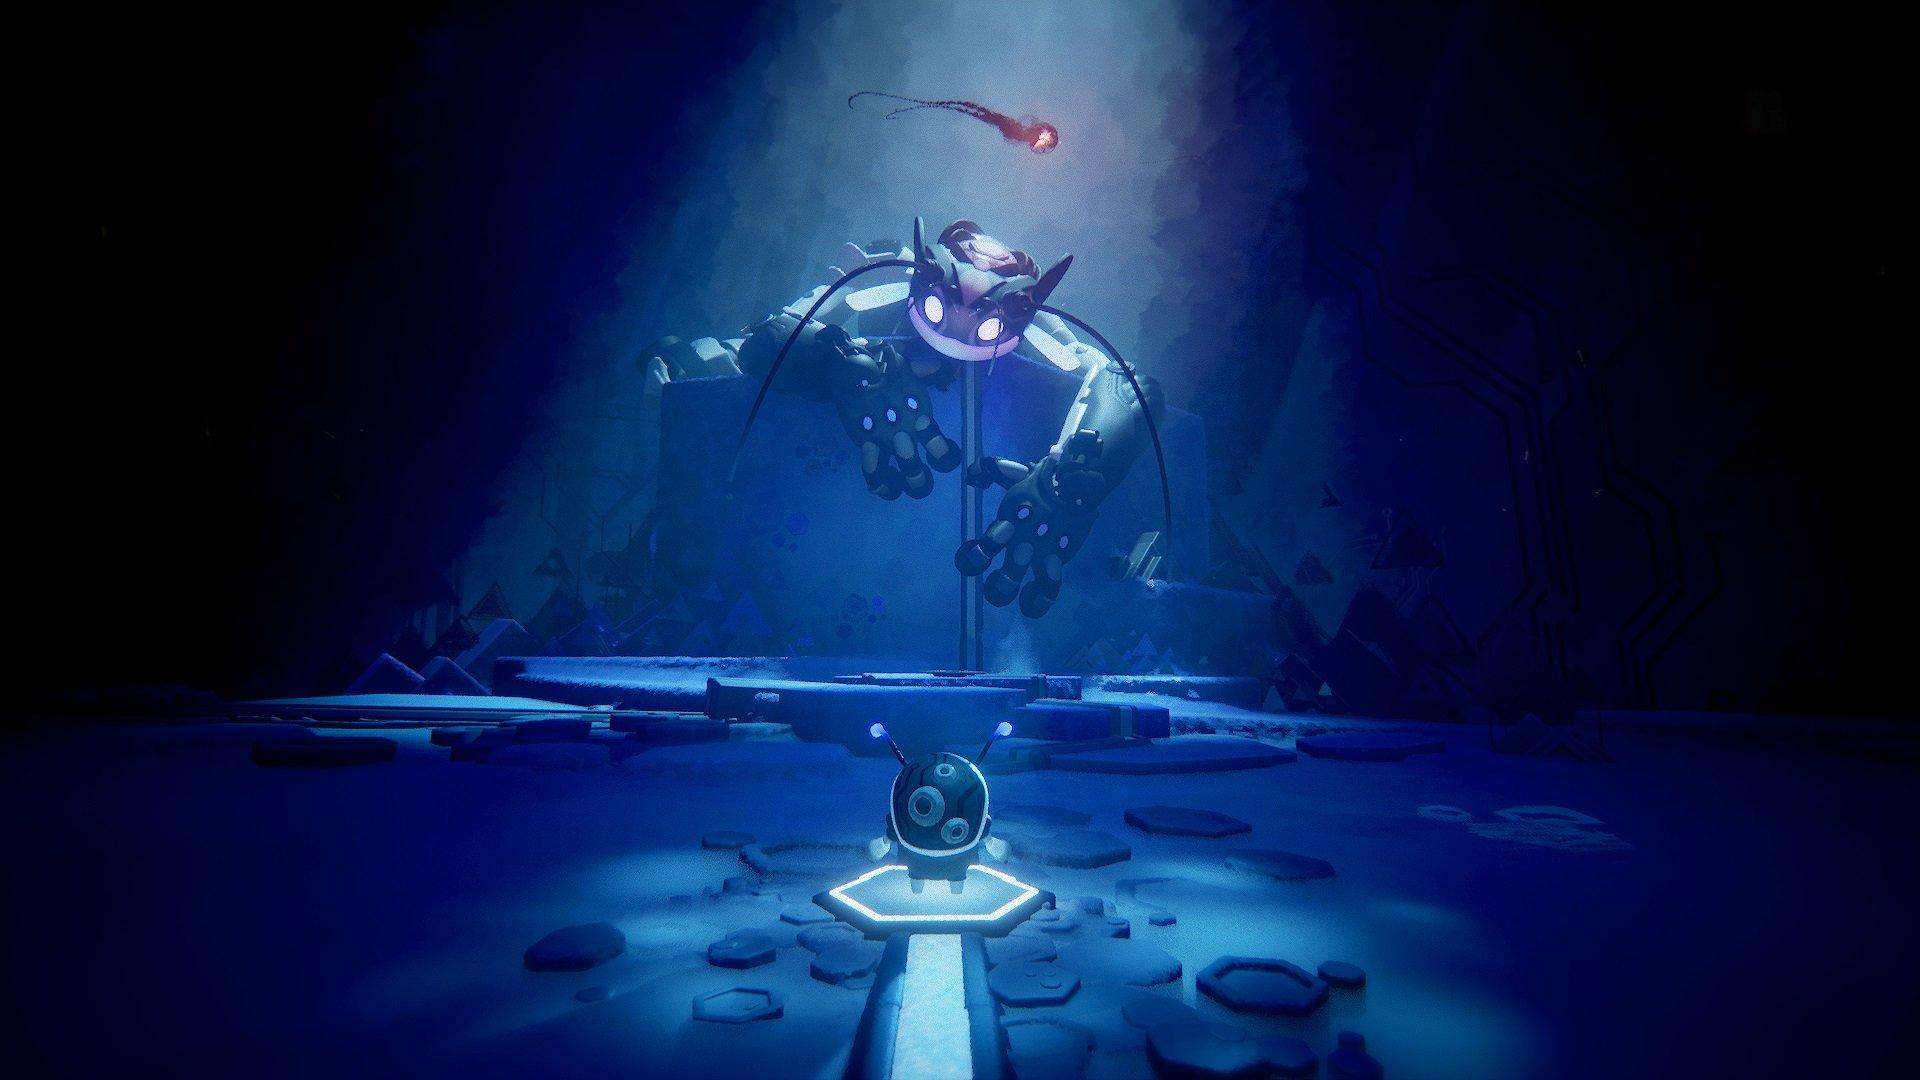 Dreams-PS4-PSX17-screenshot-01-Action